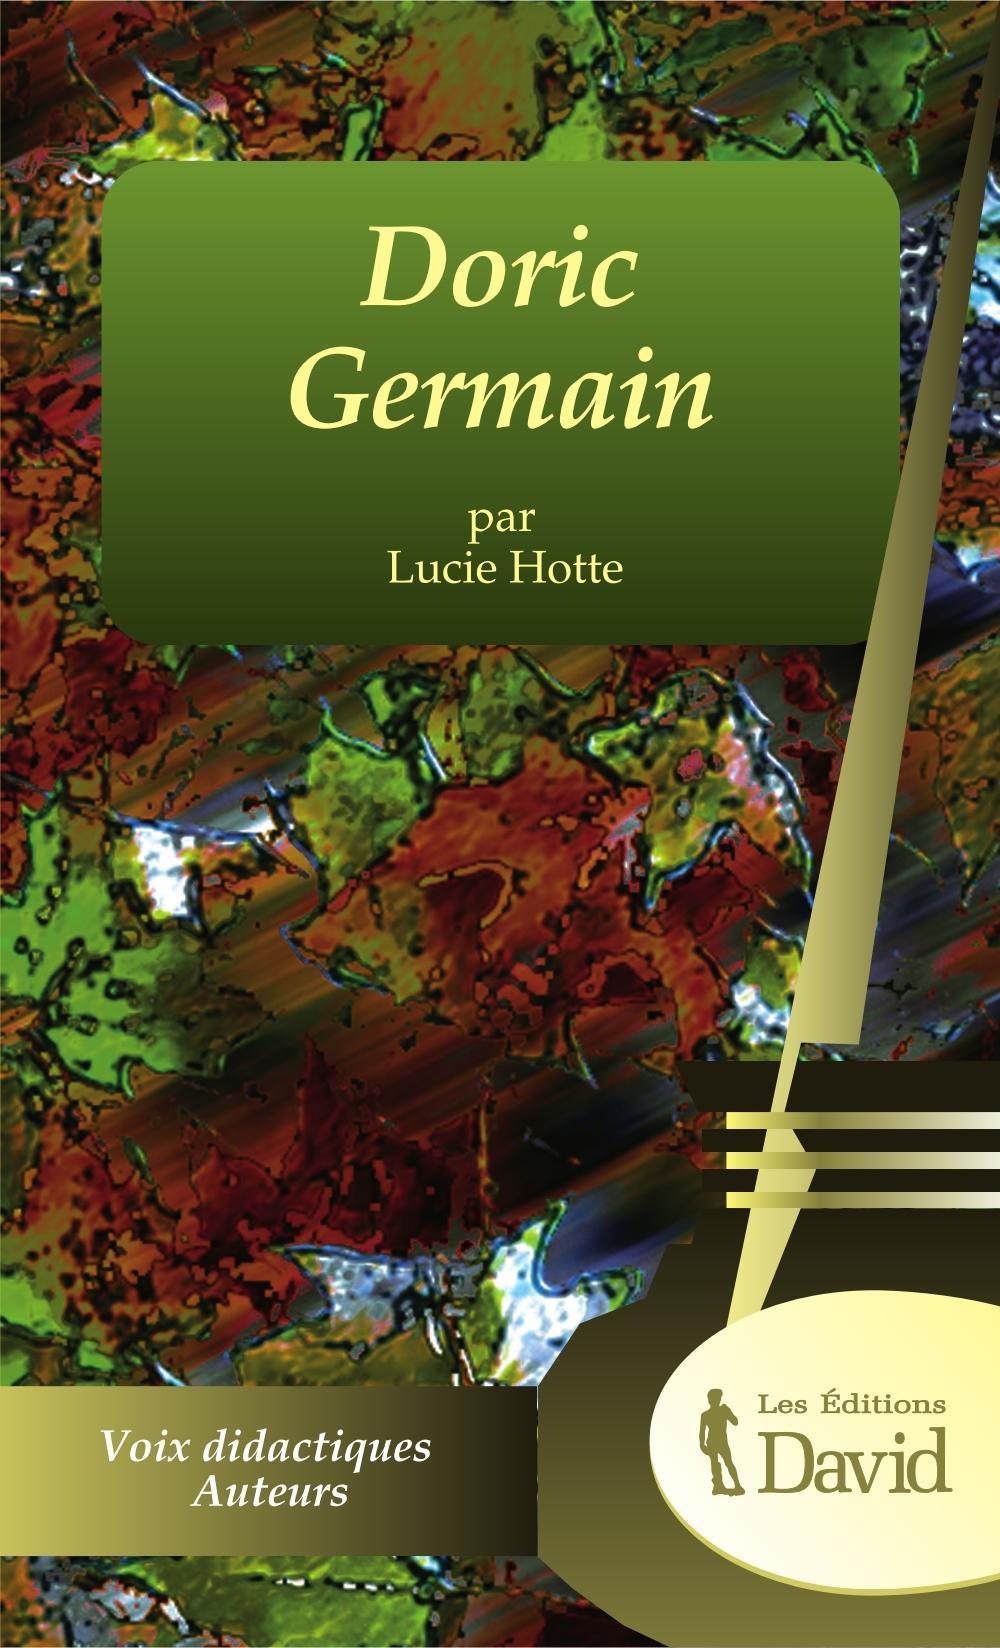 Doric Germain